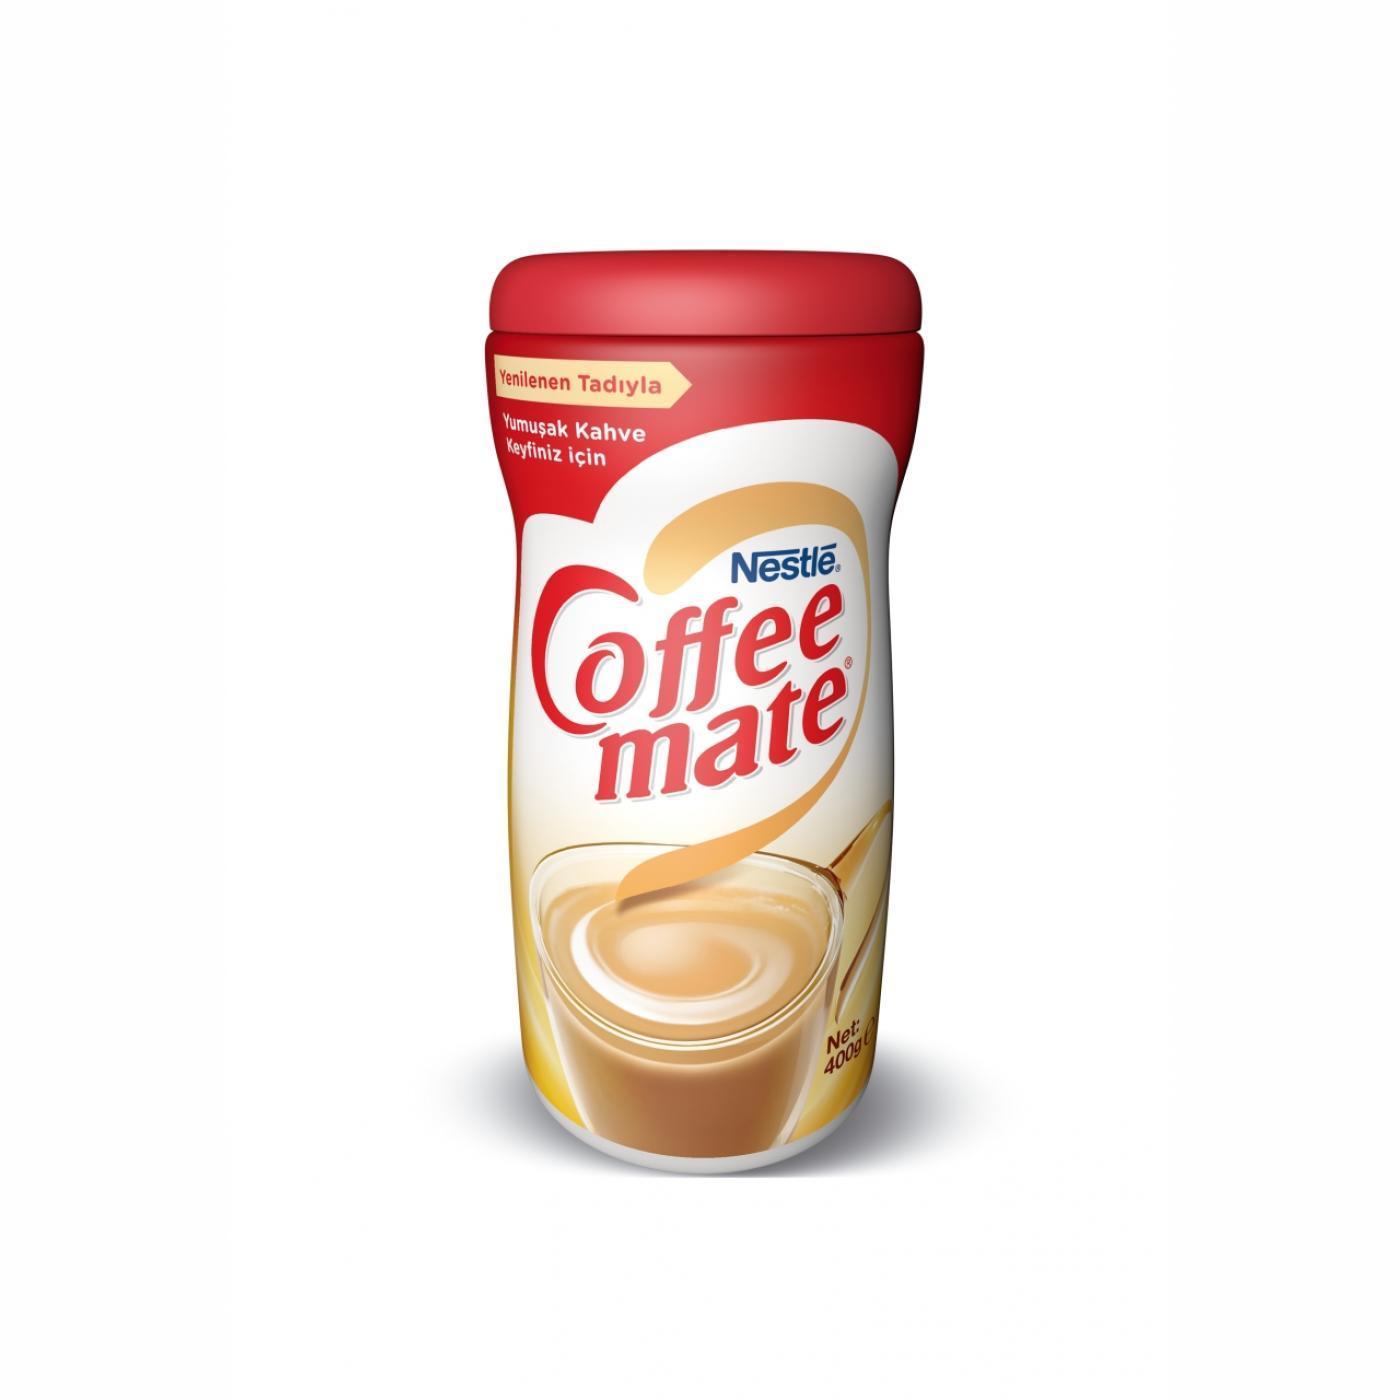 NESCAFE COFFE MATE 400GR